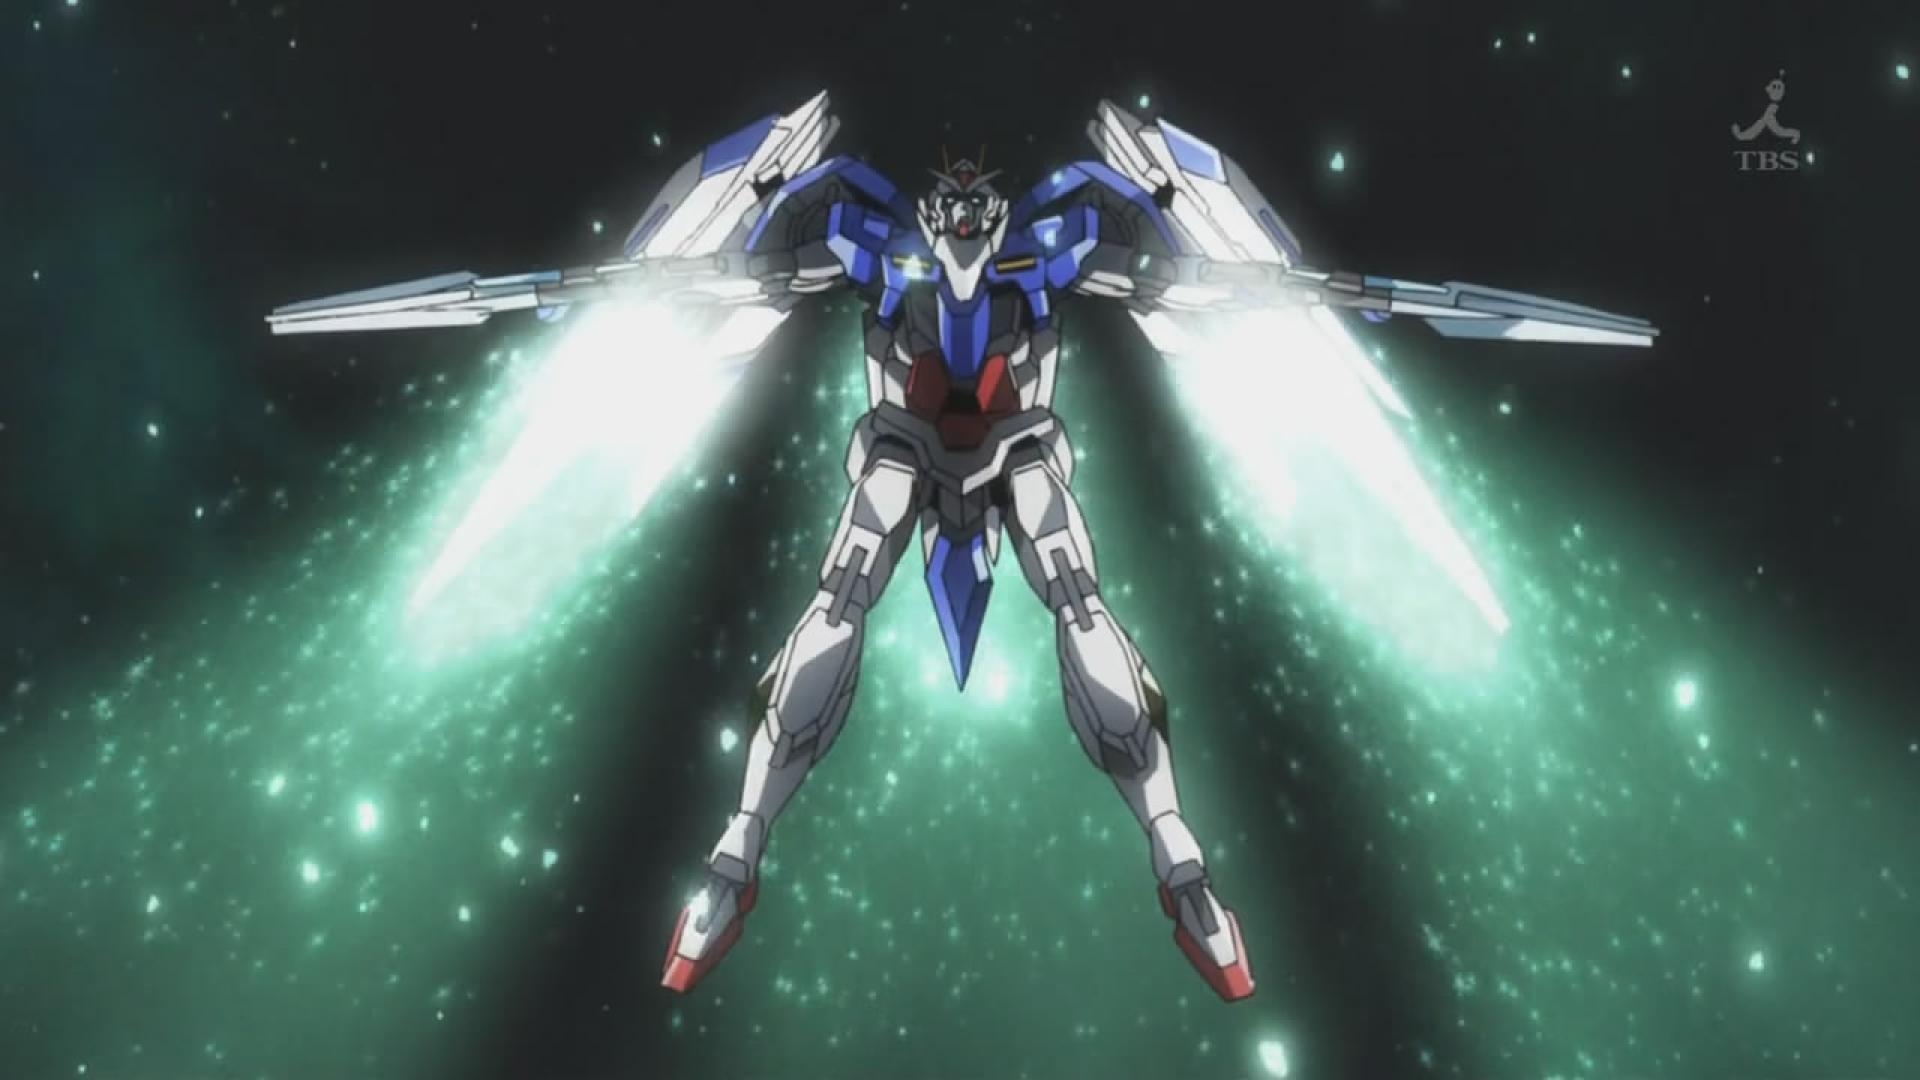 Gundam 00 wallpaper wallpapertag - Gundam wallpaper hd ...